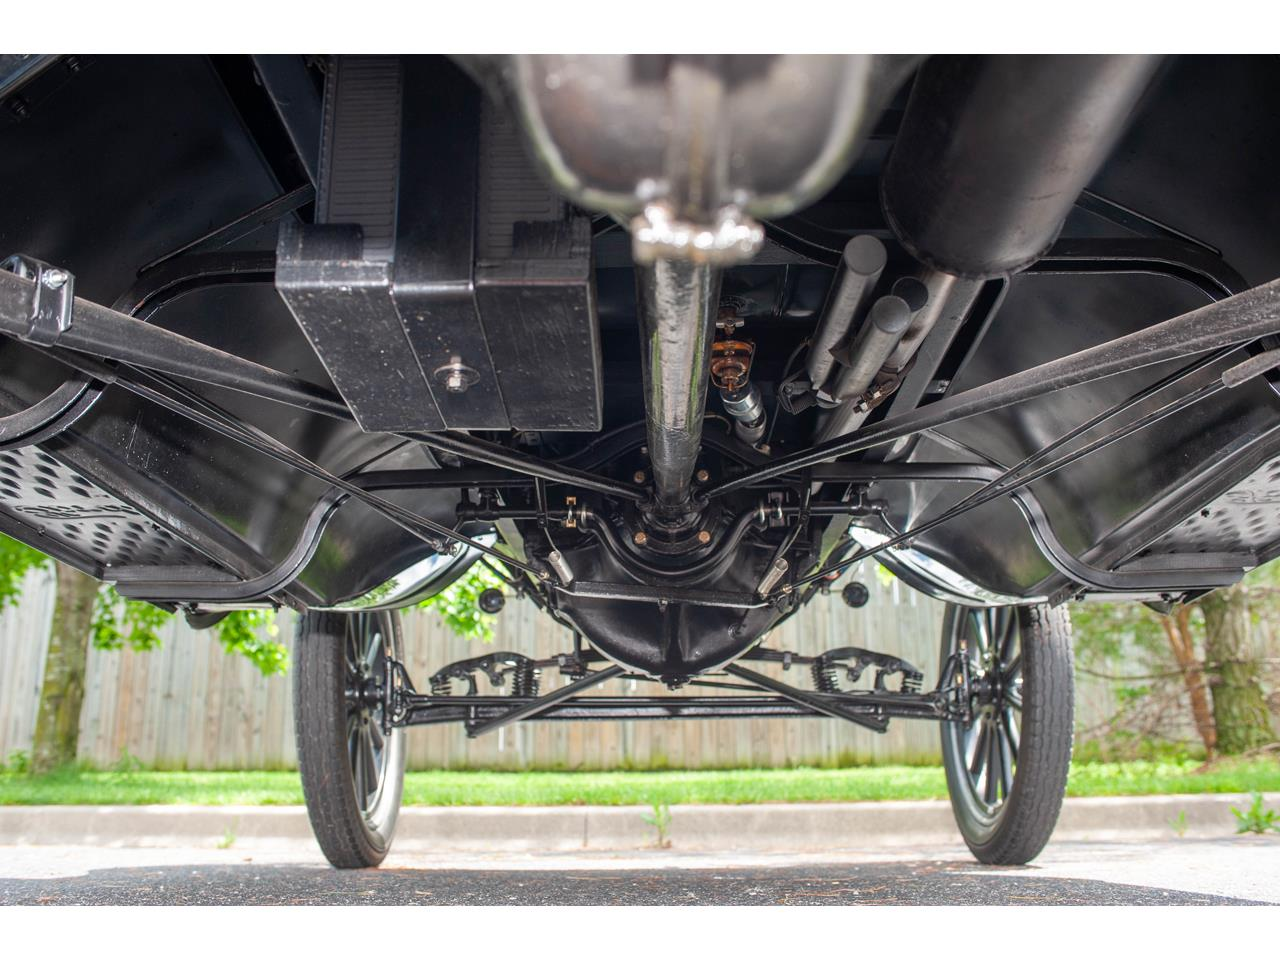 Large Picture of '25 Model T located in O'Fallon Illinois - $18,000.00 - QB96